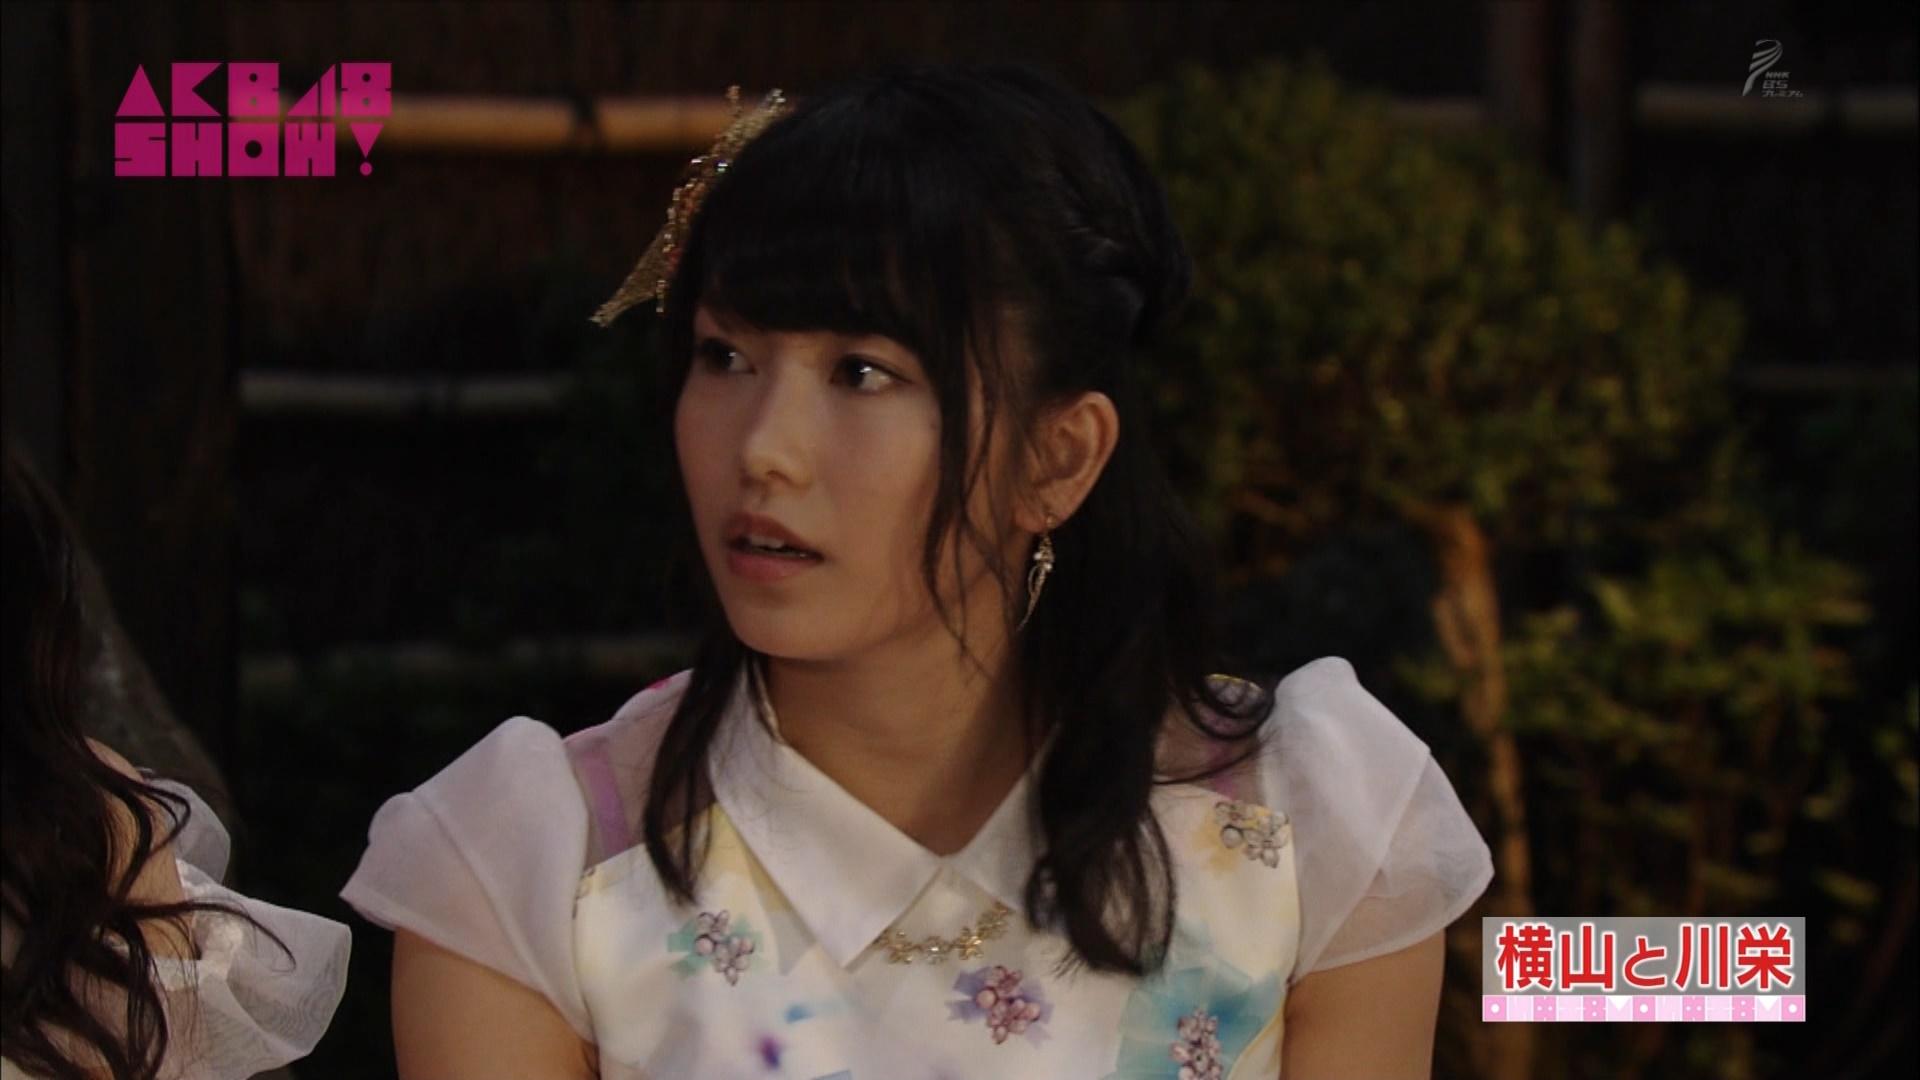 横山由依と川栄李奈 AKB48SHOW! 20140906 (49)